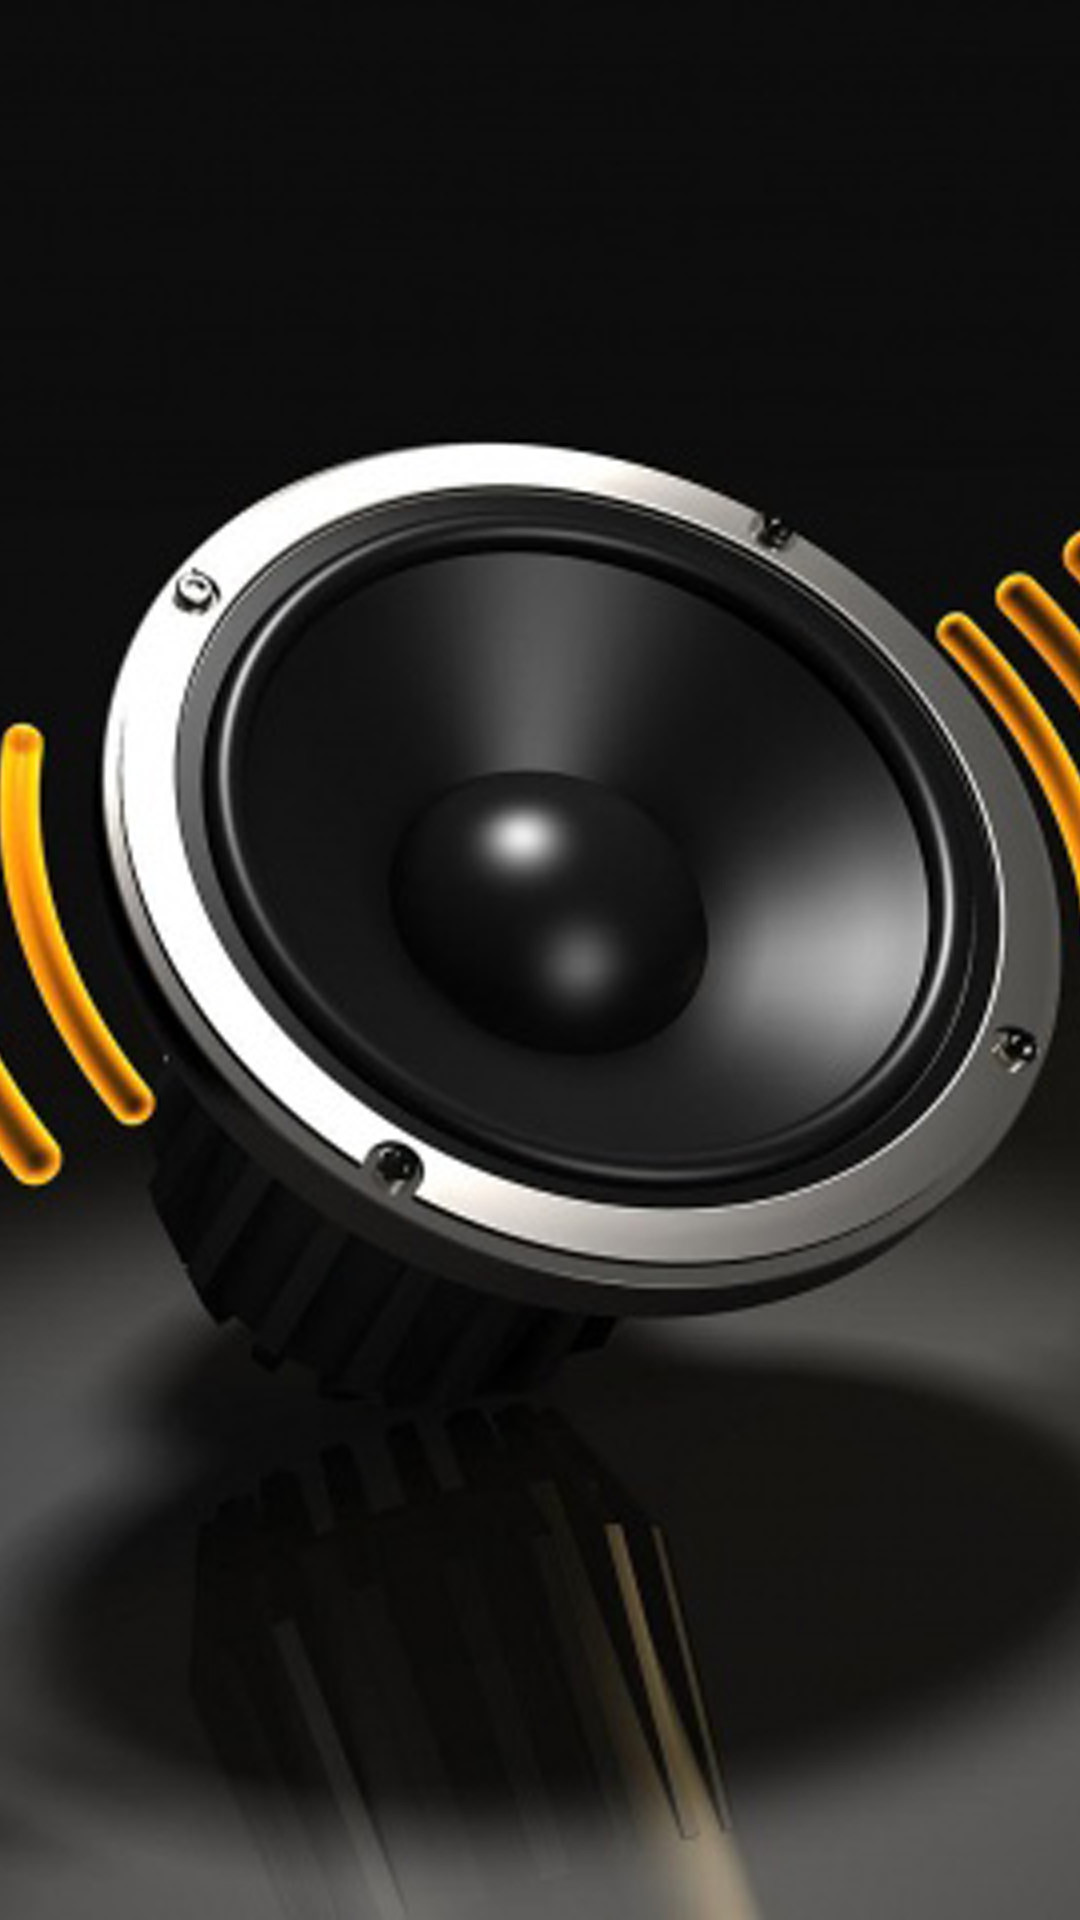 Black Speaker Lockscreen Android Wallpaper …